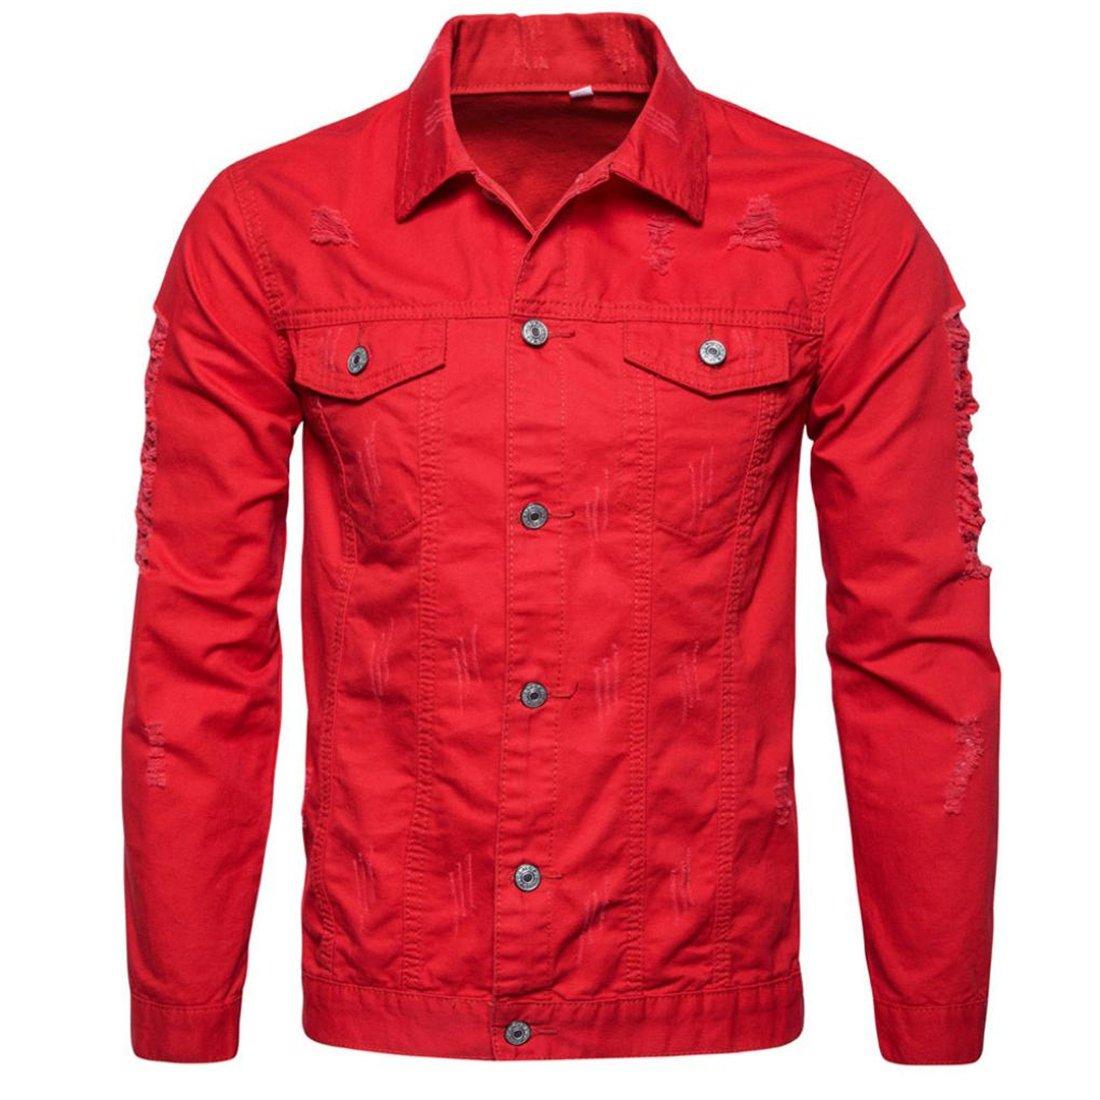 HANYI Mens Personality Fashion Slim Fit Long Sleeve Denim Hole Jacket Tops Coat Outwear HANYI-0945